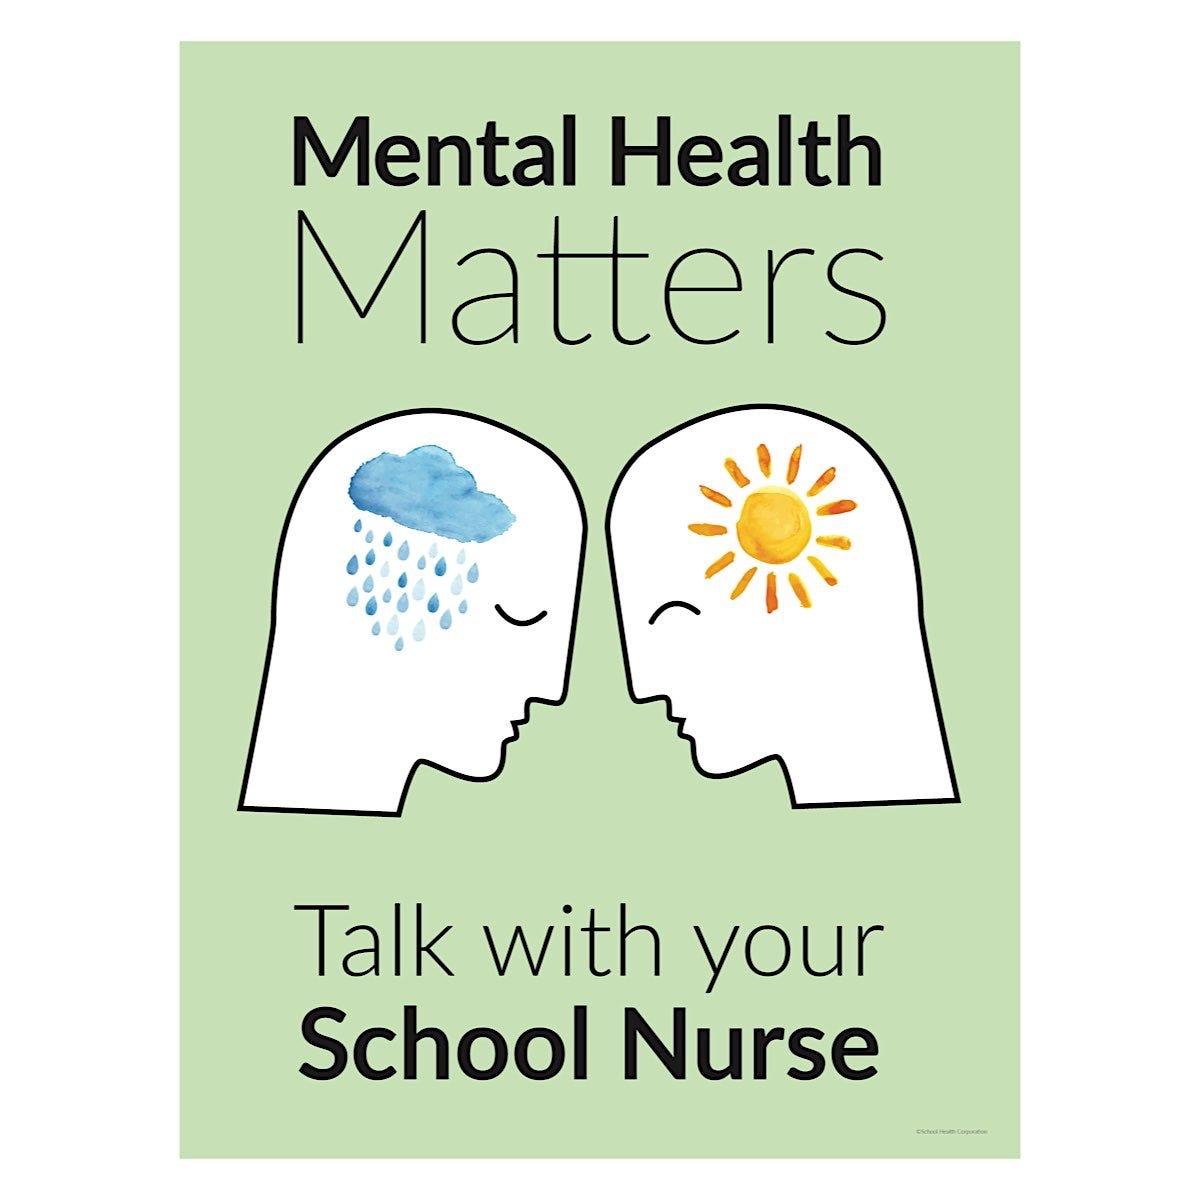 School Health Mental Health Matters Poster